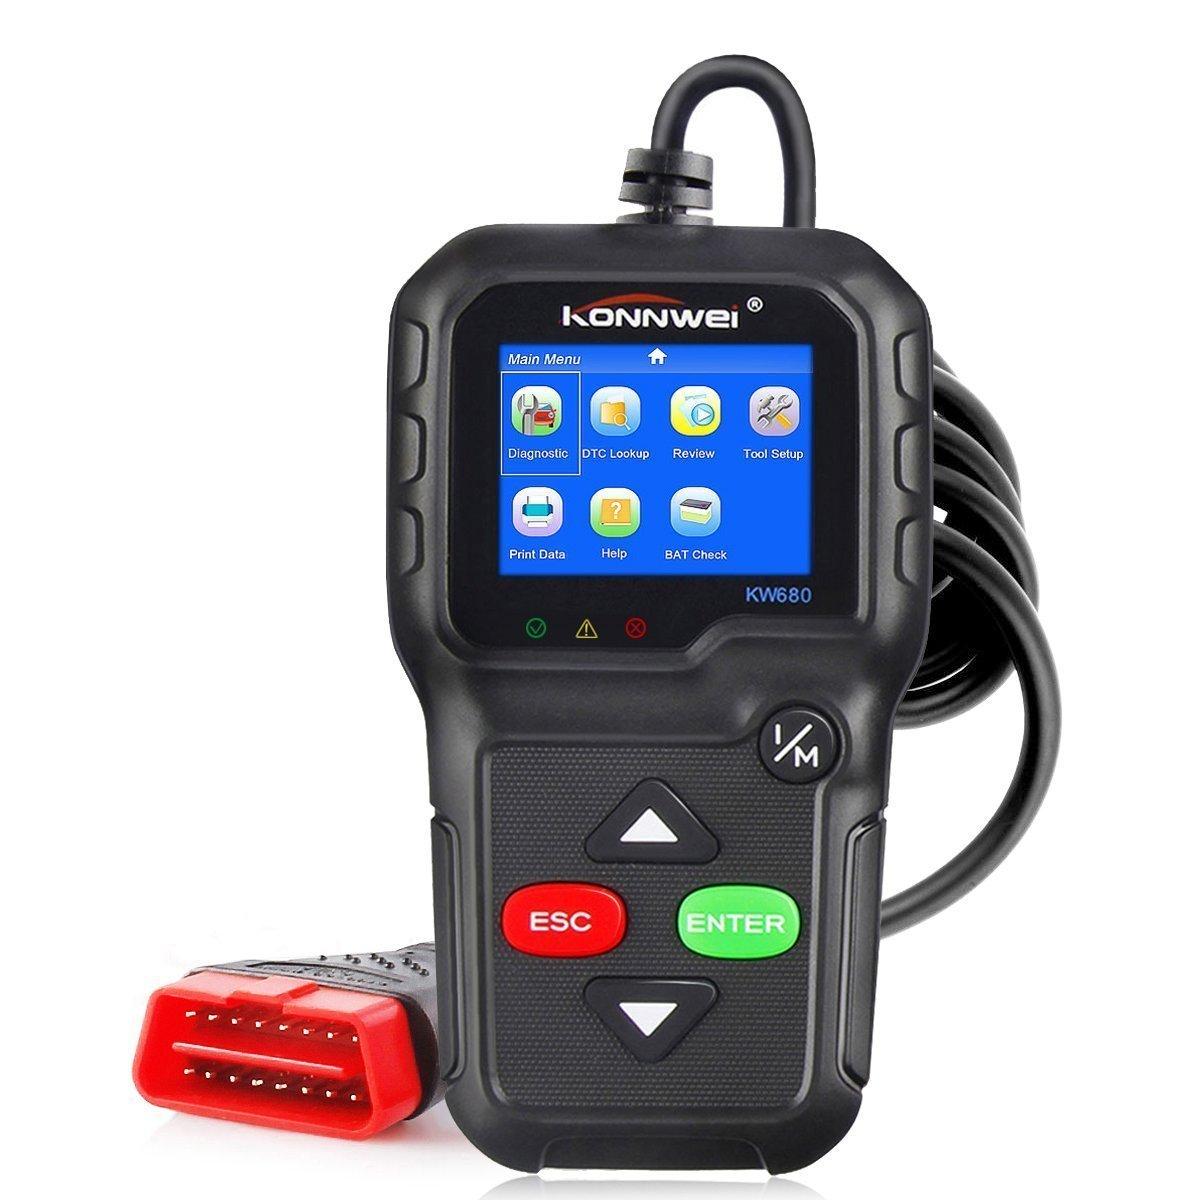 HuaRui obd2車コードリーダー自動診断、エンジンチェックライトKONNWEI kw680 OBDII obd2スキャンツール B078YXY528